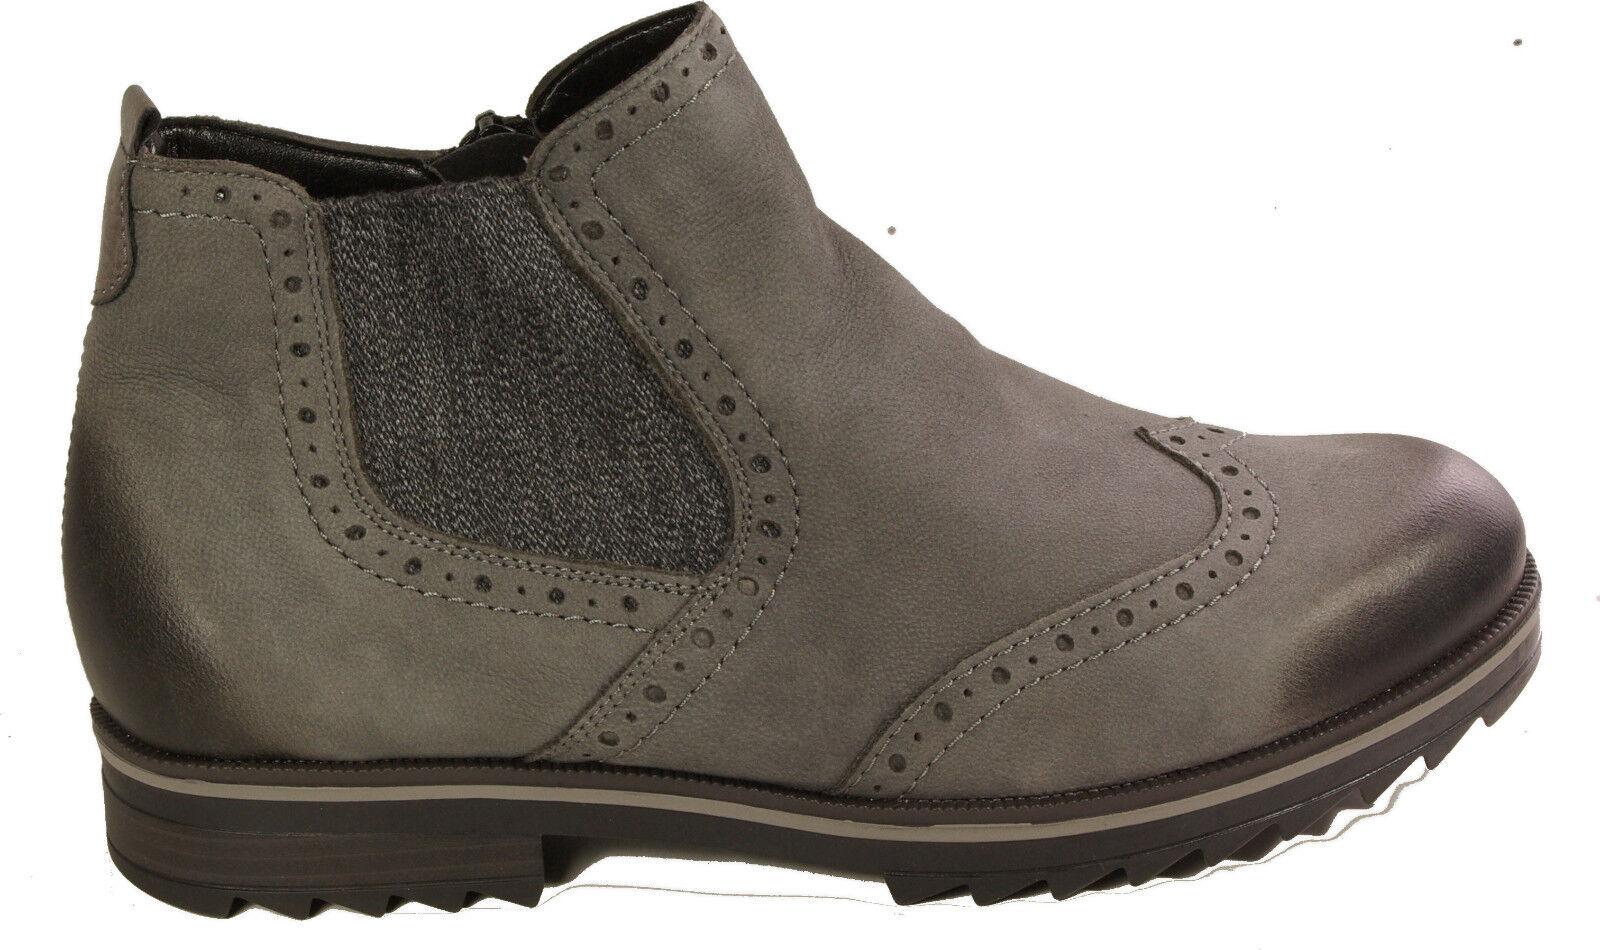 REMONTE Schuhe Stiefeletten Chelsea Ankle Boots  echt Leder Reißverschluss NEU